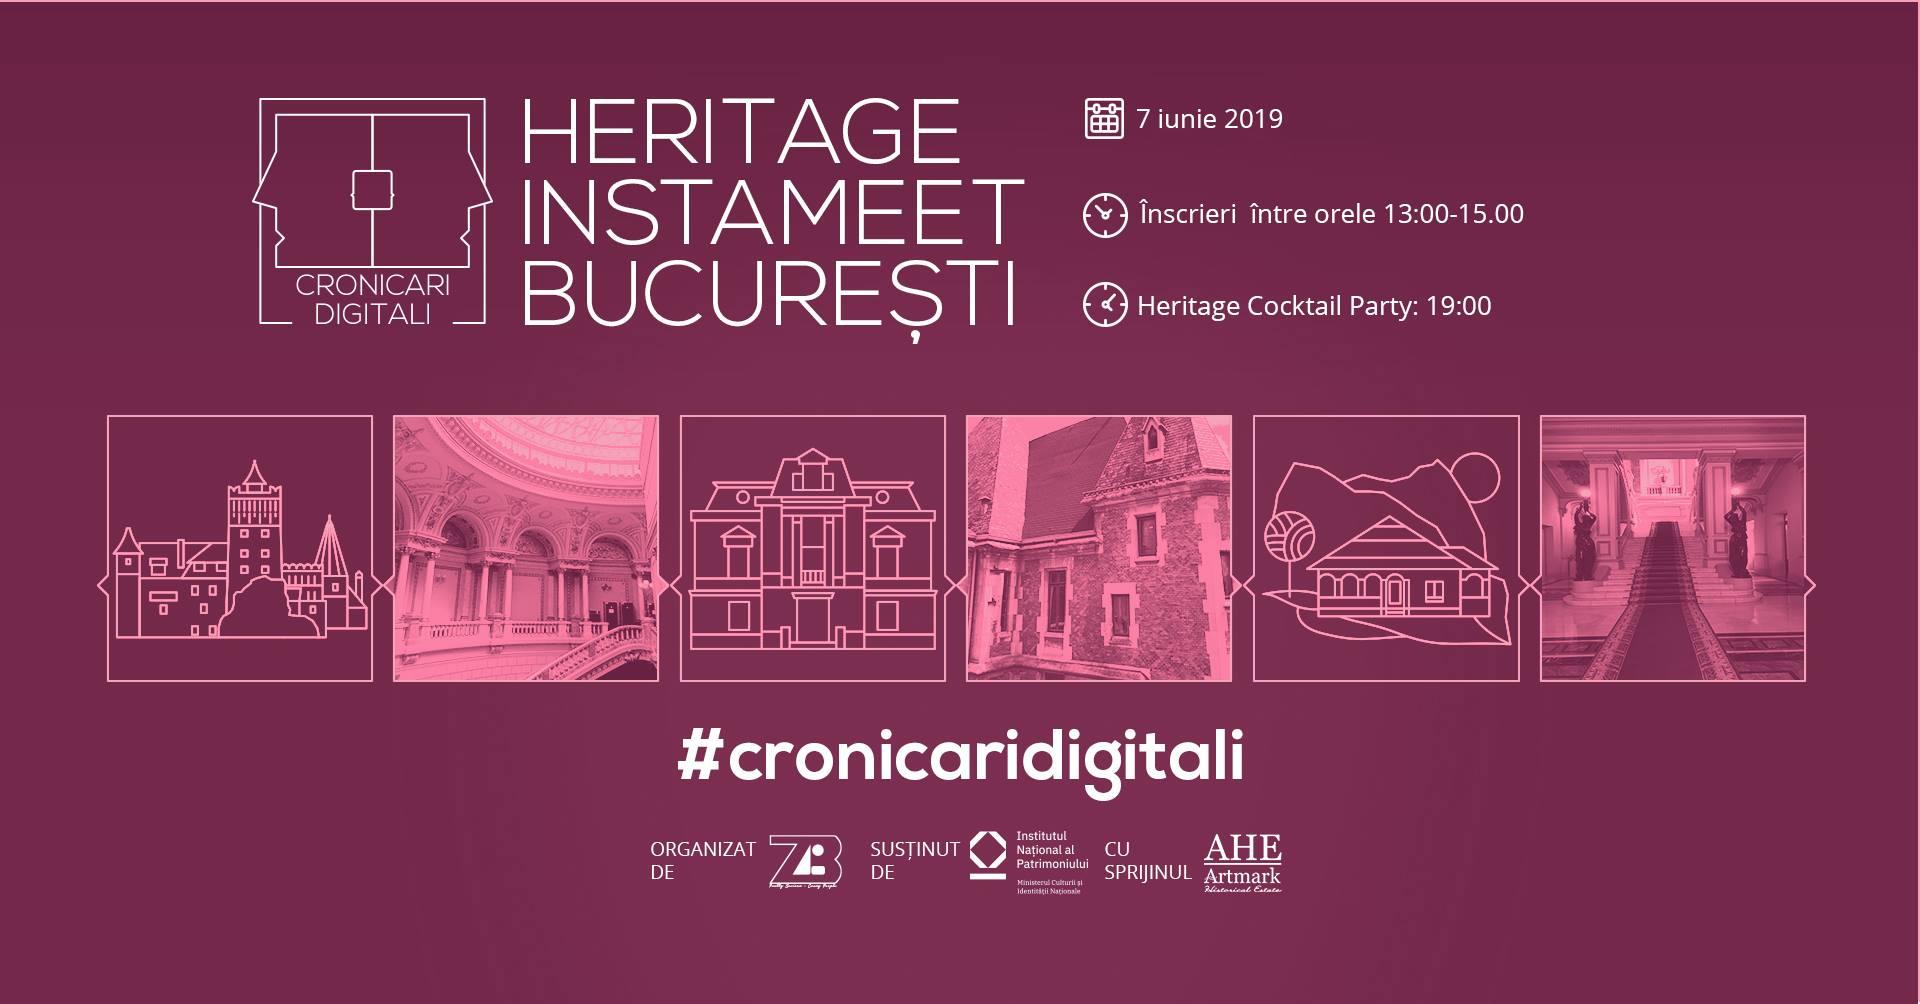 https://www.sothebysrealty.ro/wp/wp-content/uploads/2019/06/Heritage-Instameet-Cronicari-Digitali.jpg